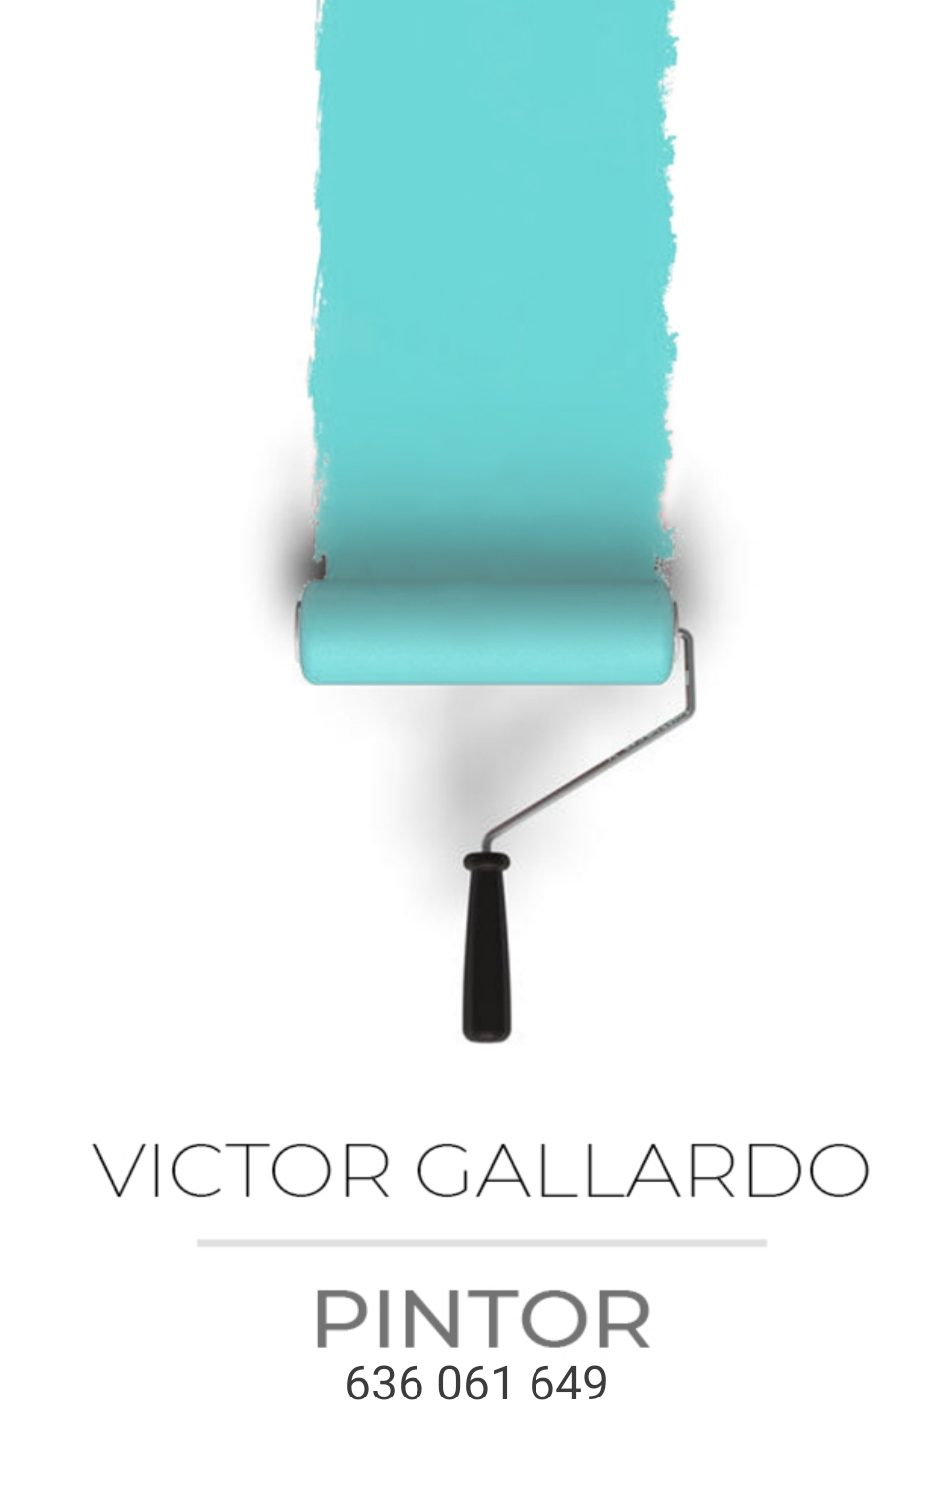 victor gallardo.jpg